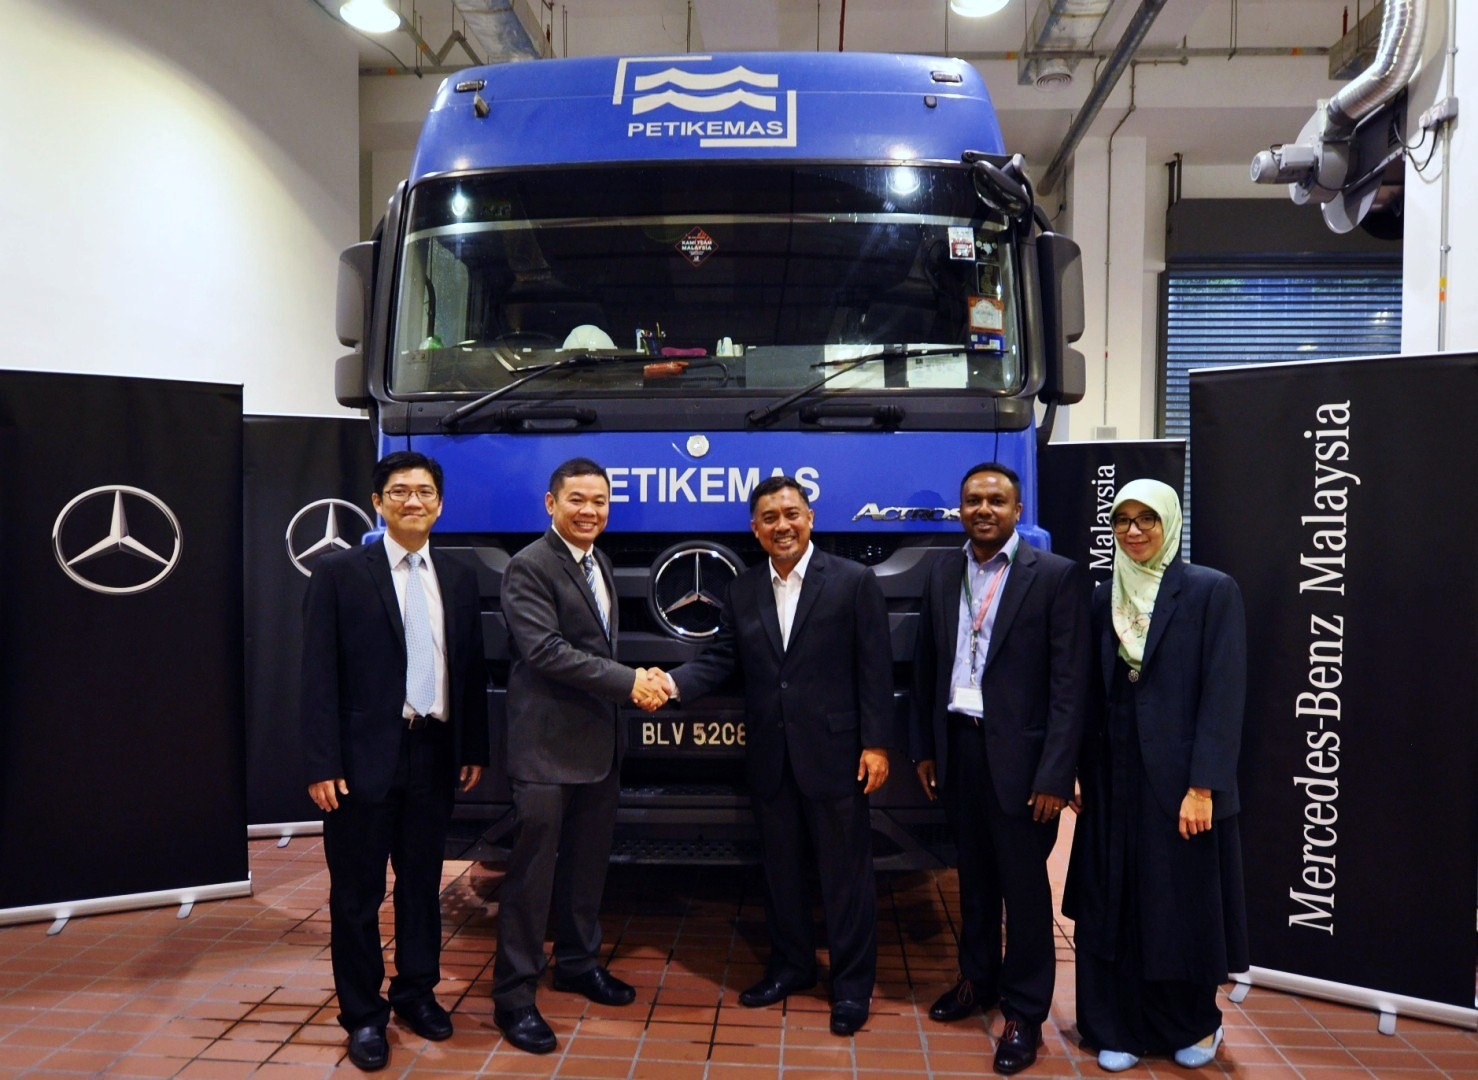 Motoring-Malaysia: Truck News: Syarikat Logistik Petikemas Renews ...